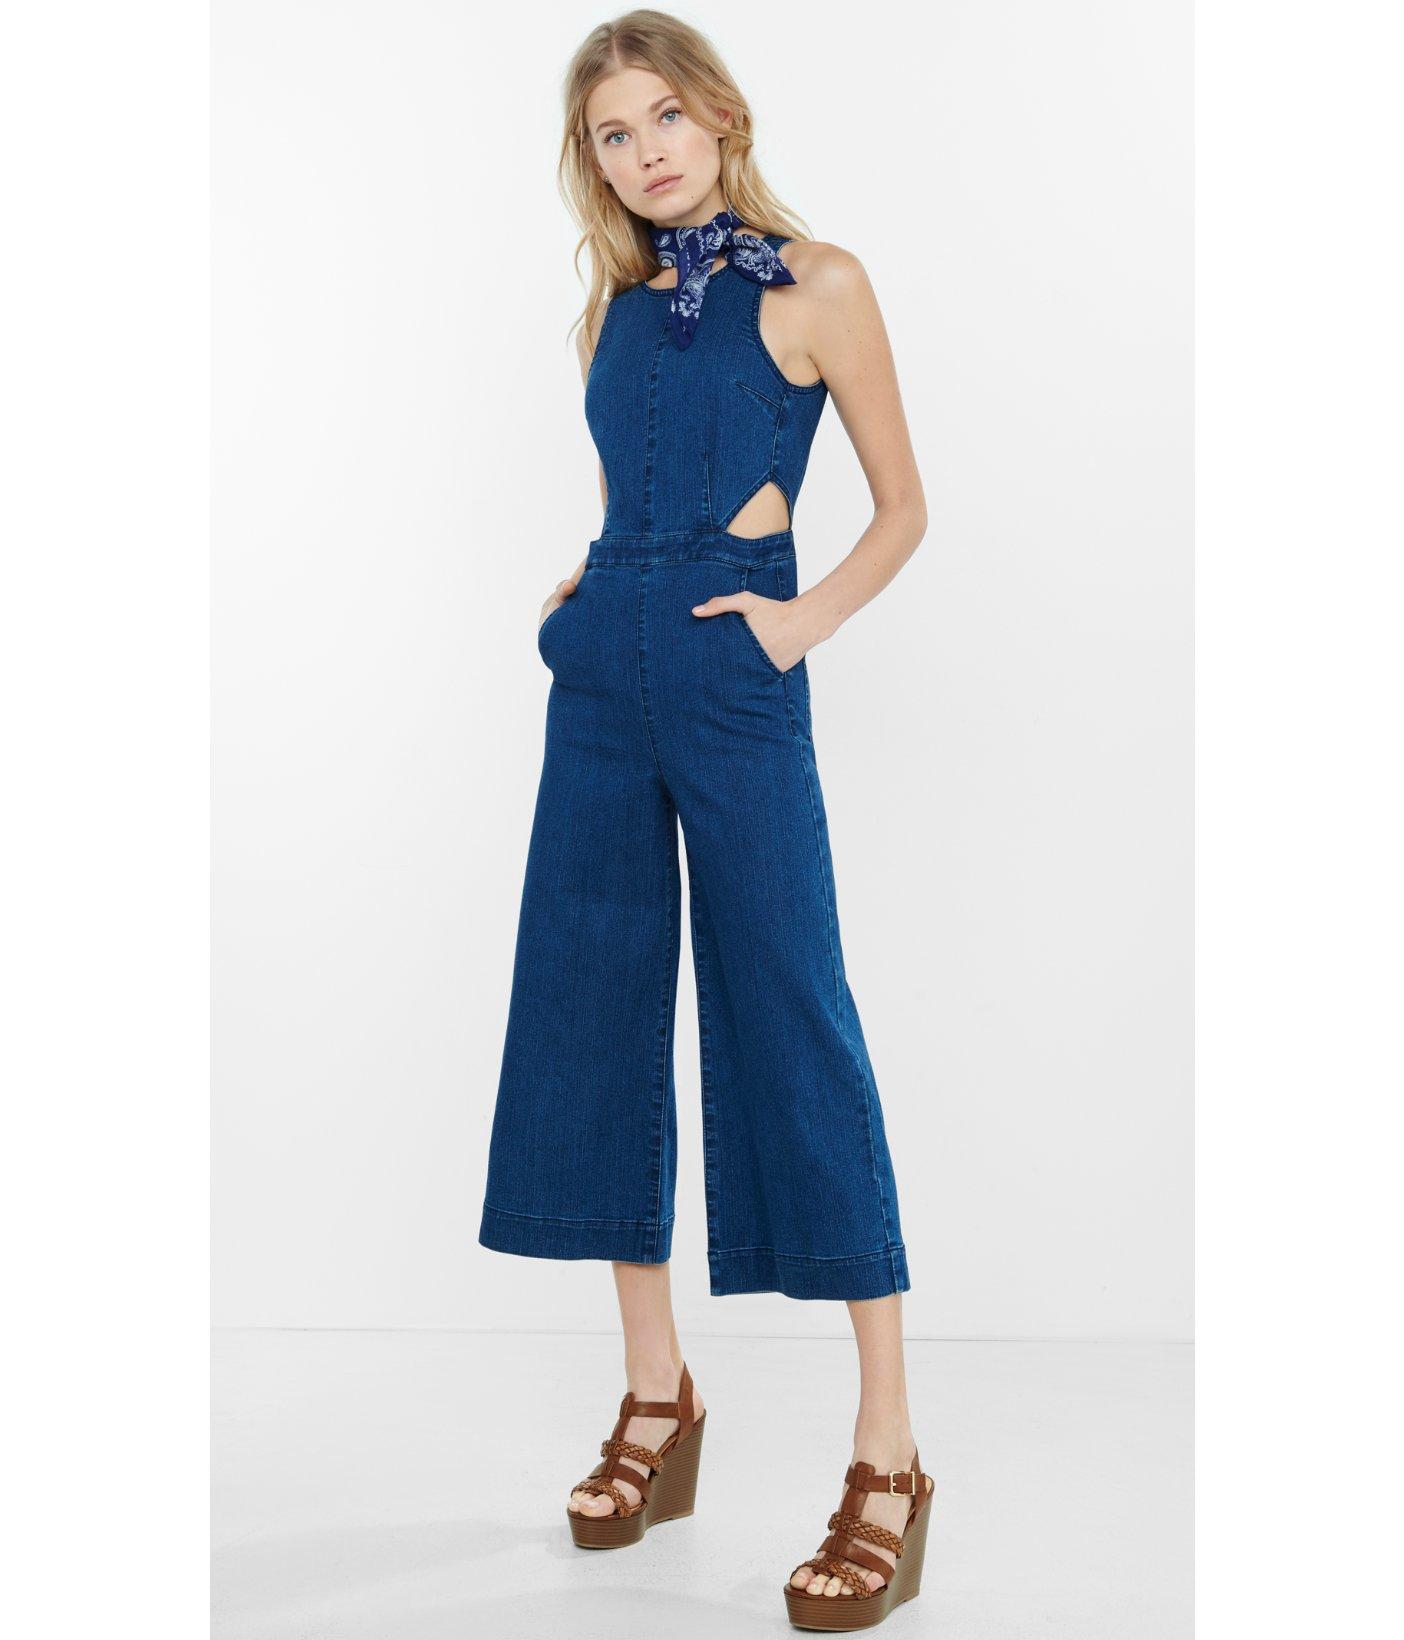 bf9d2e5780e Lyst - Express Sleeveless Denim Cut-out Culotte Jumpsuit in Blue